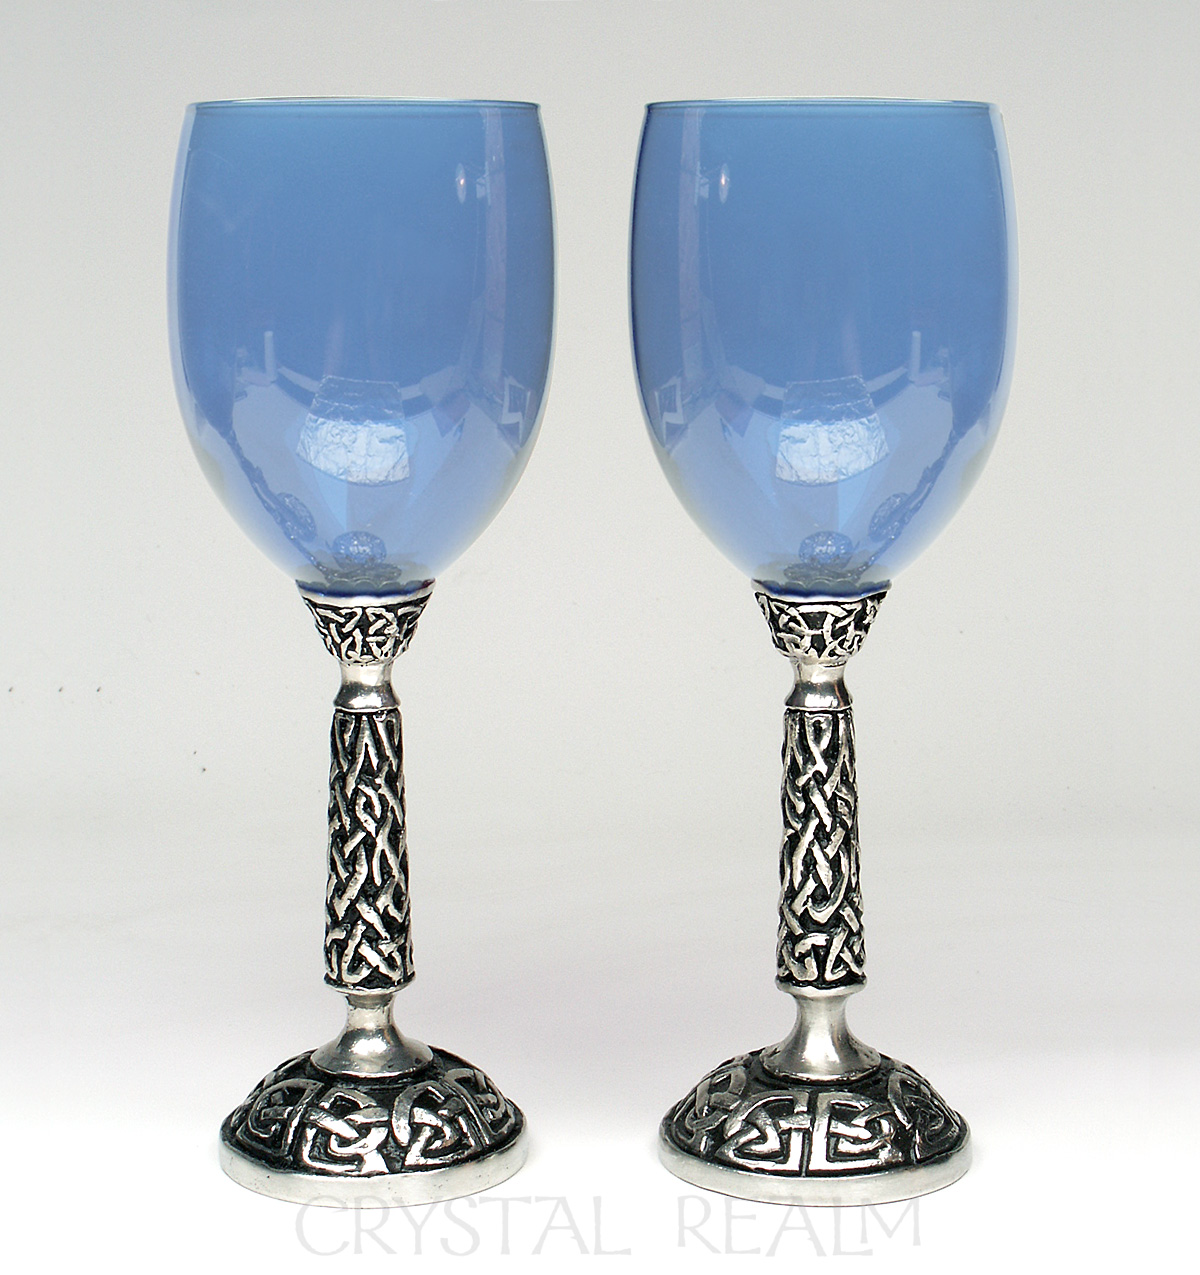 Blue communion goblet or wine glass with Celtic knotwork stem